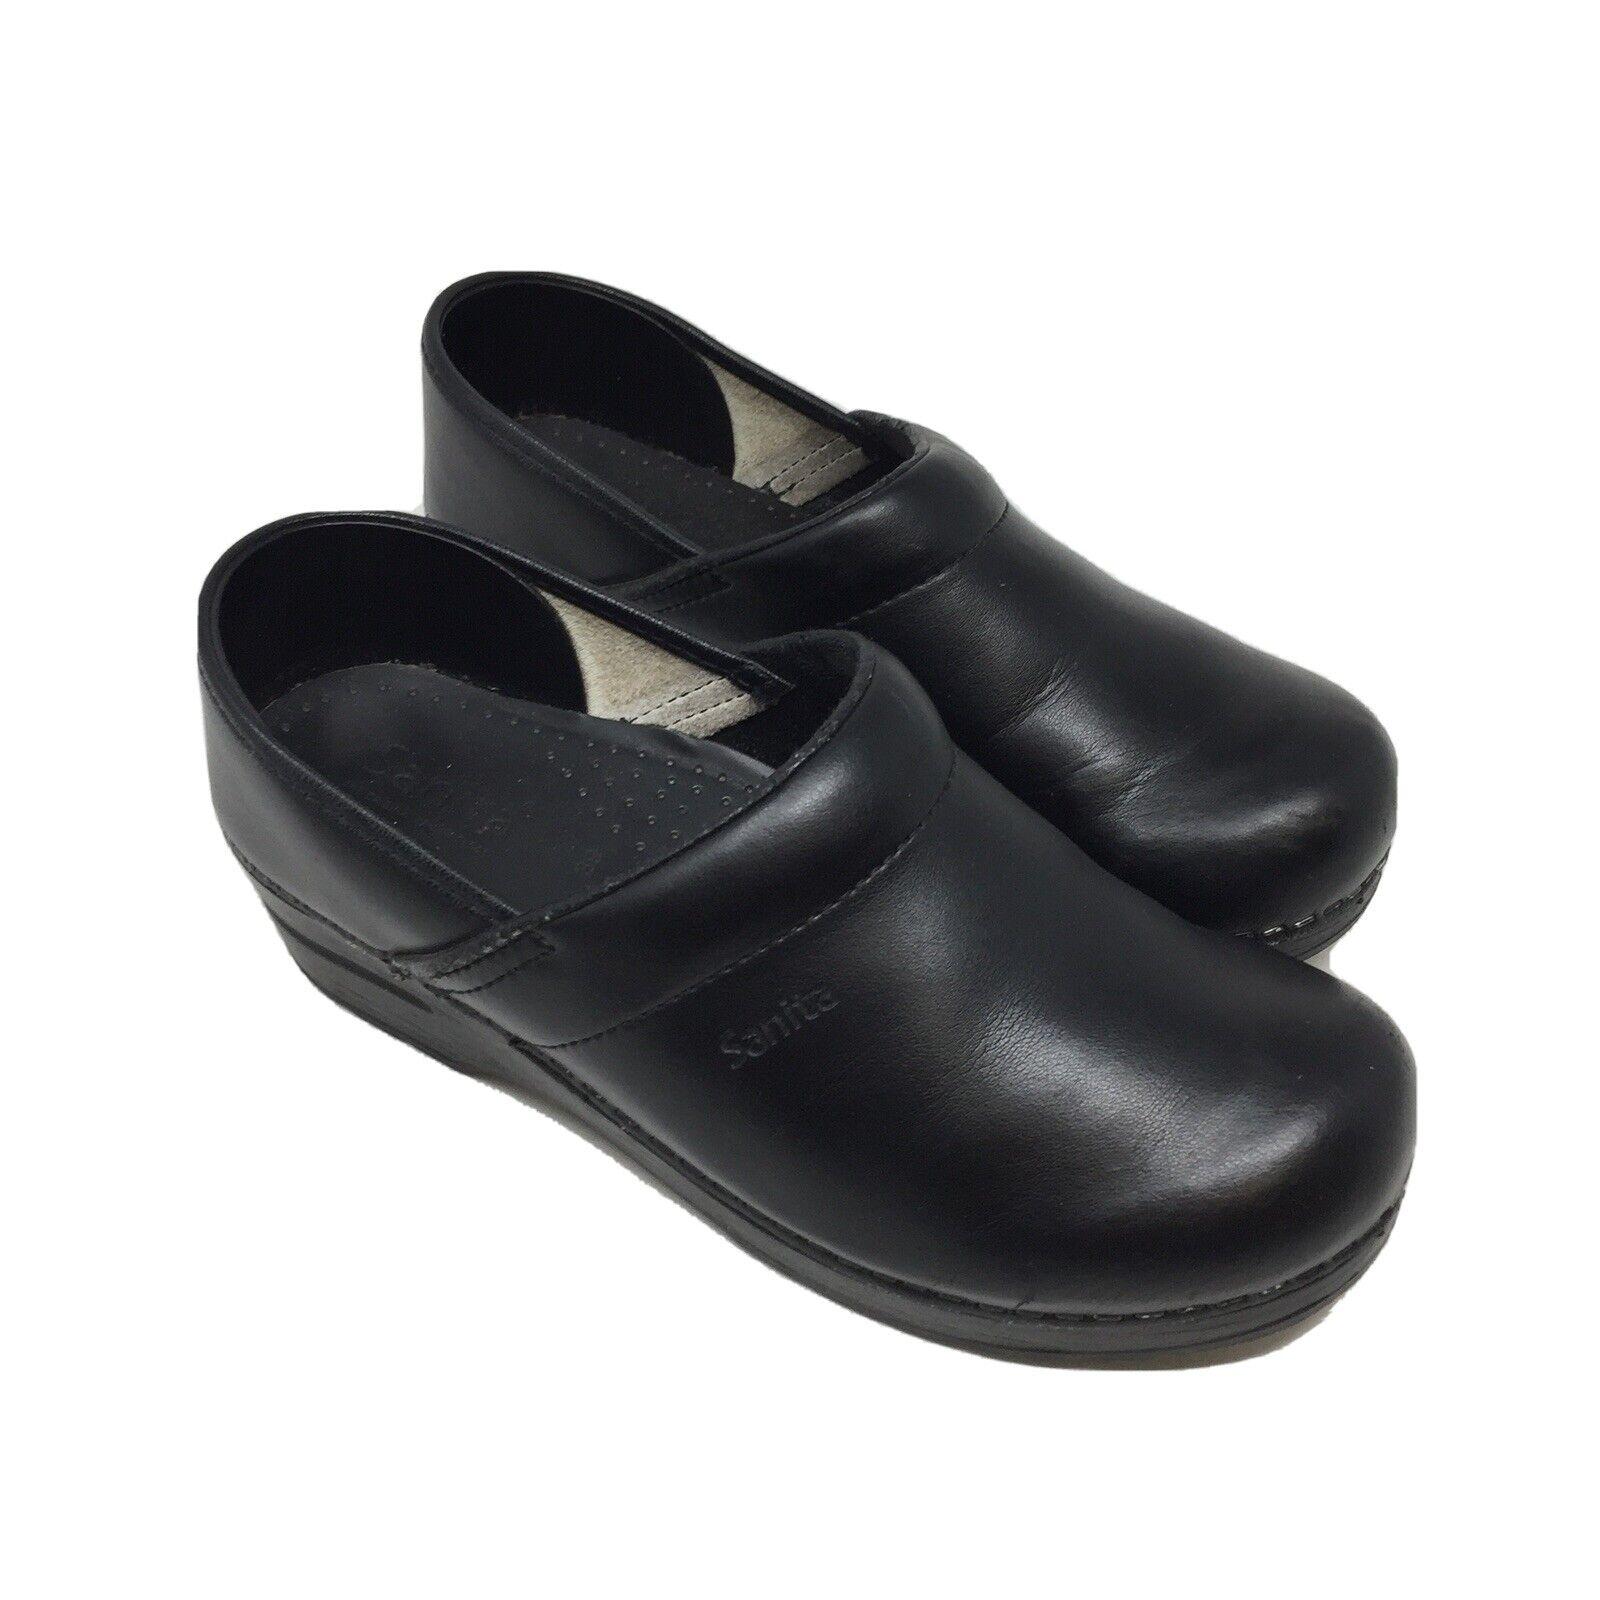 Sanita Clogs Size 8.5 EU 39 Black Leather Comfort Danish Shoes